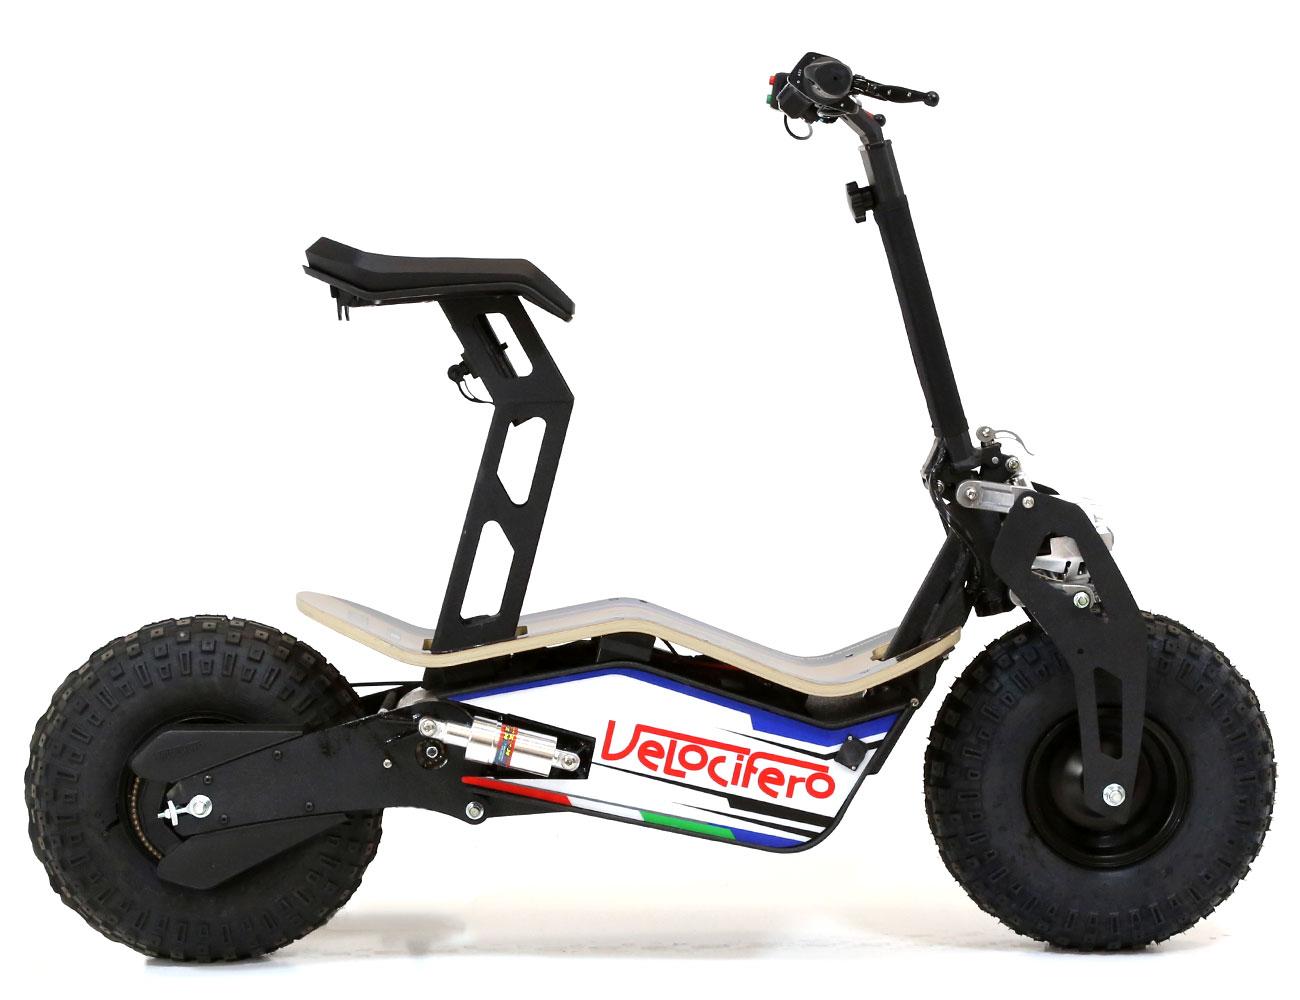 velocifero mad 48 volt 1600w electric scooter nypd. Black Bedroom Furniture Sets. Home Design Ideas